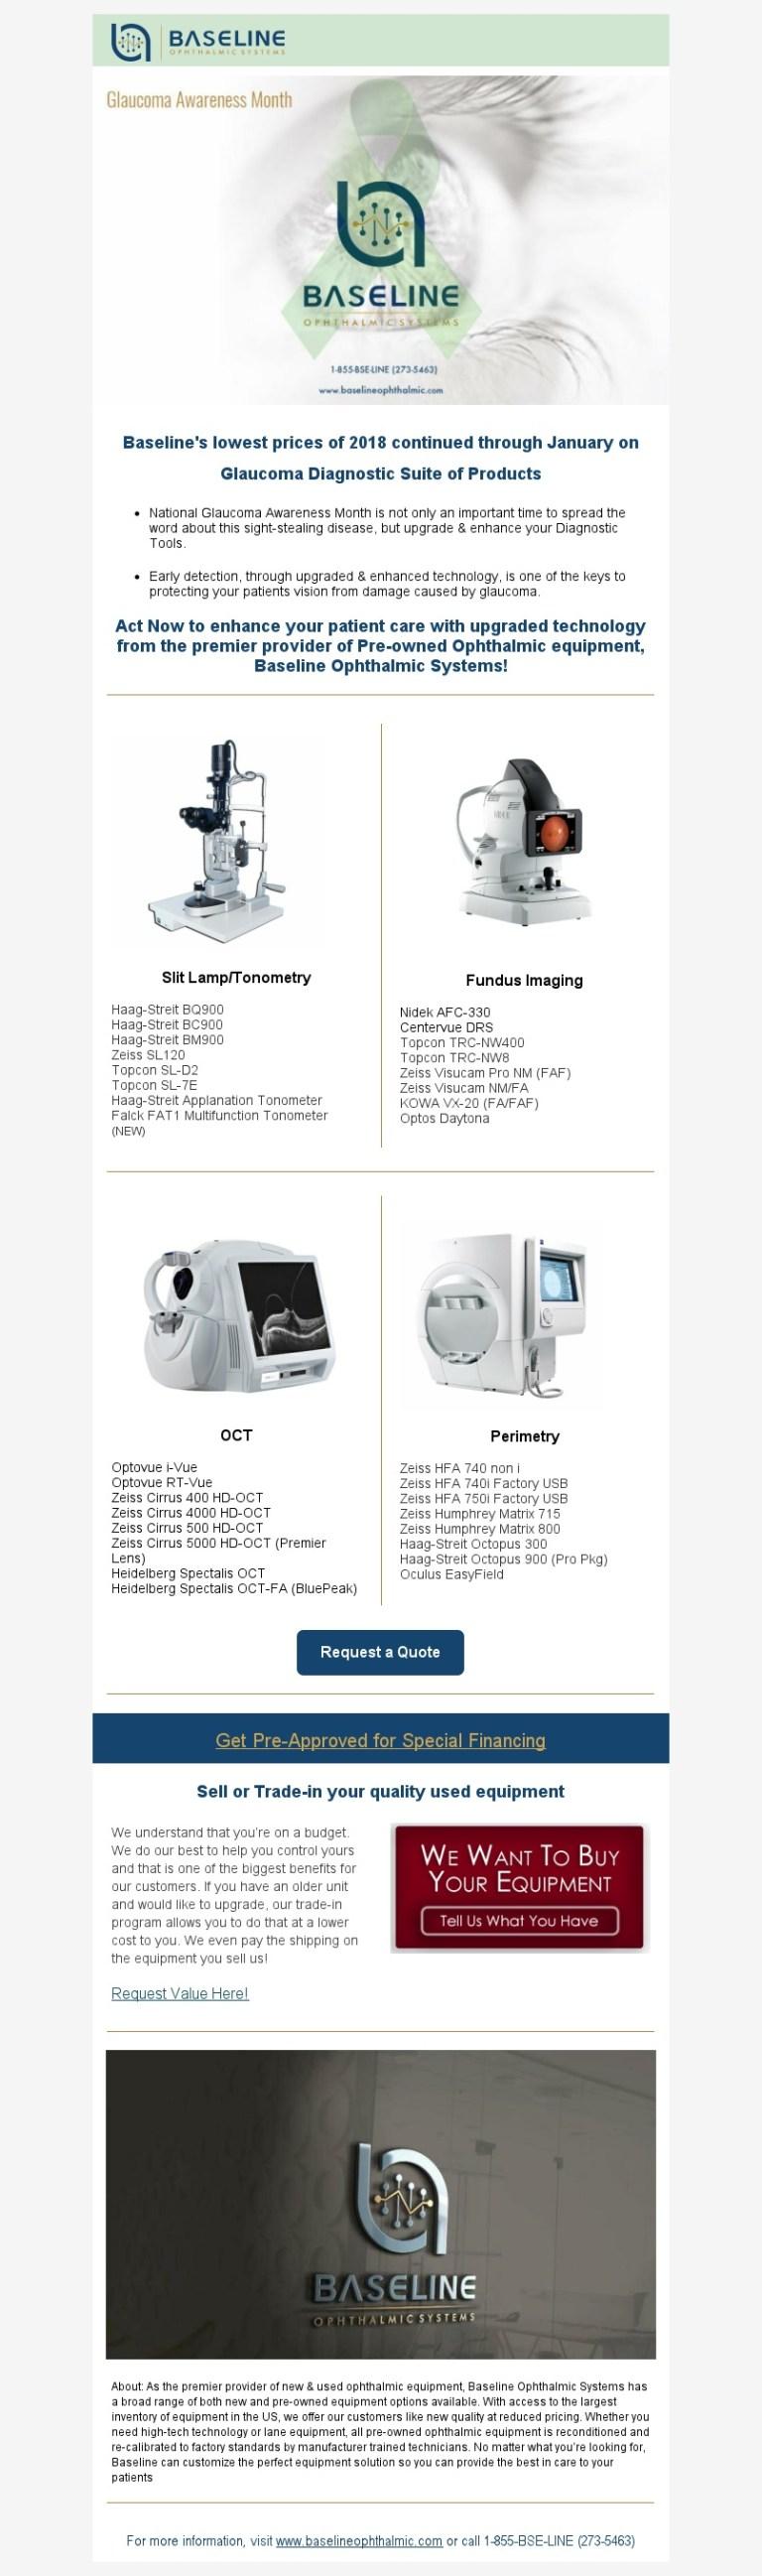 Glaucoma Awareness Month Promo (1)